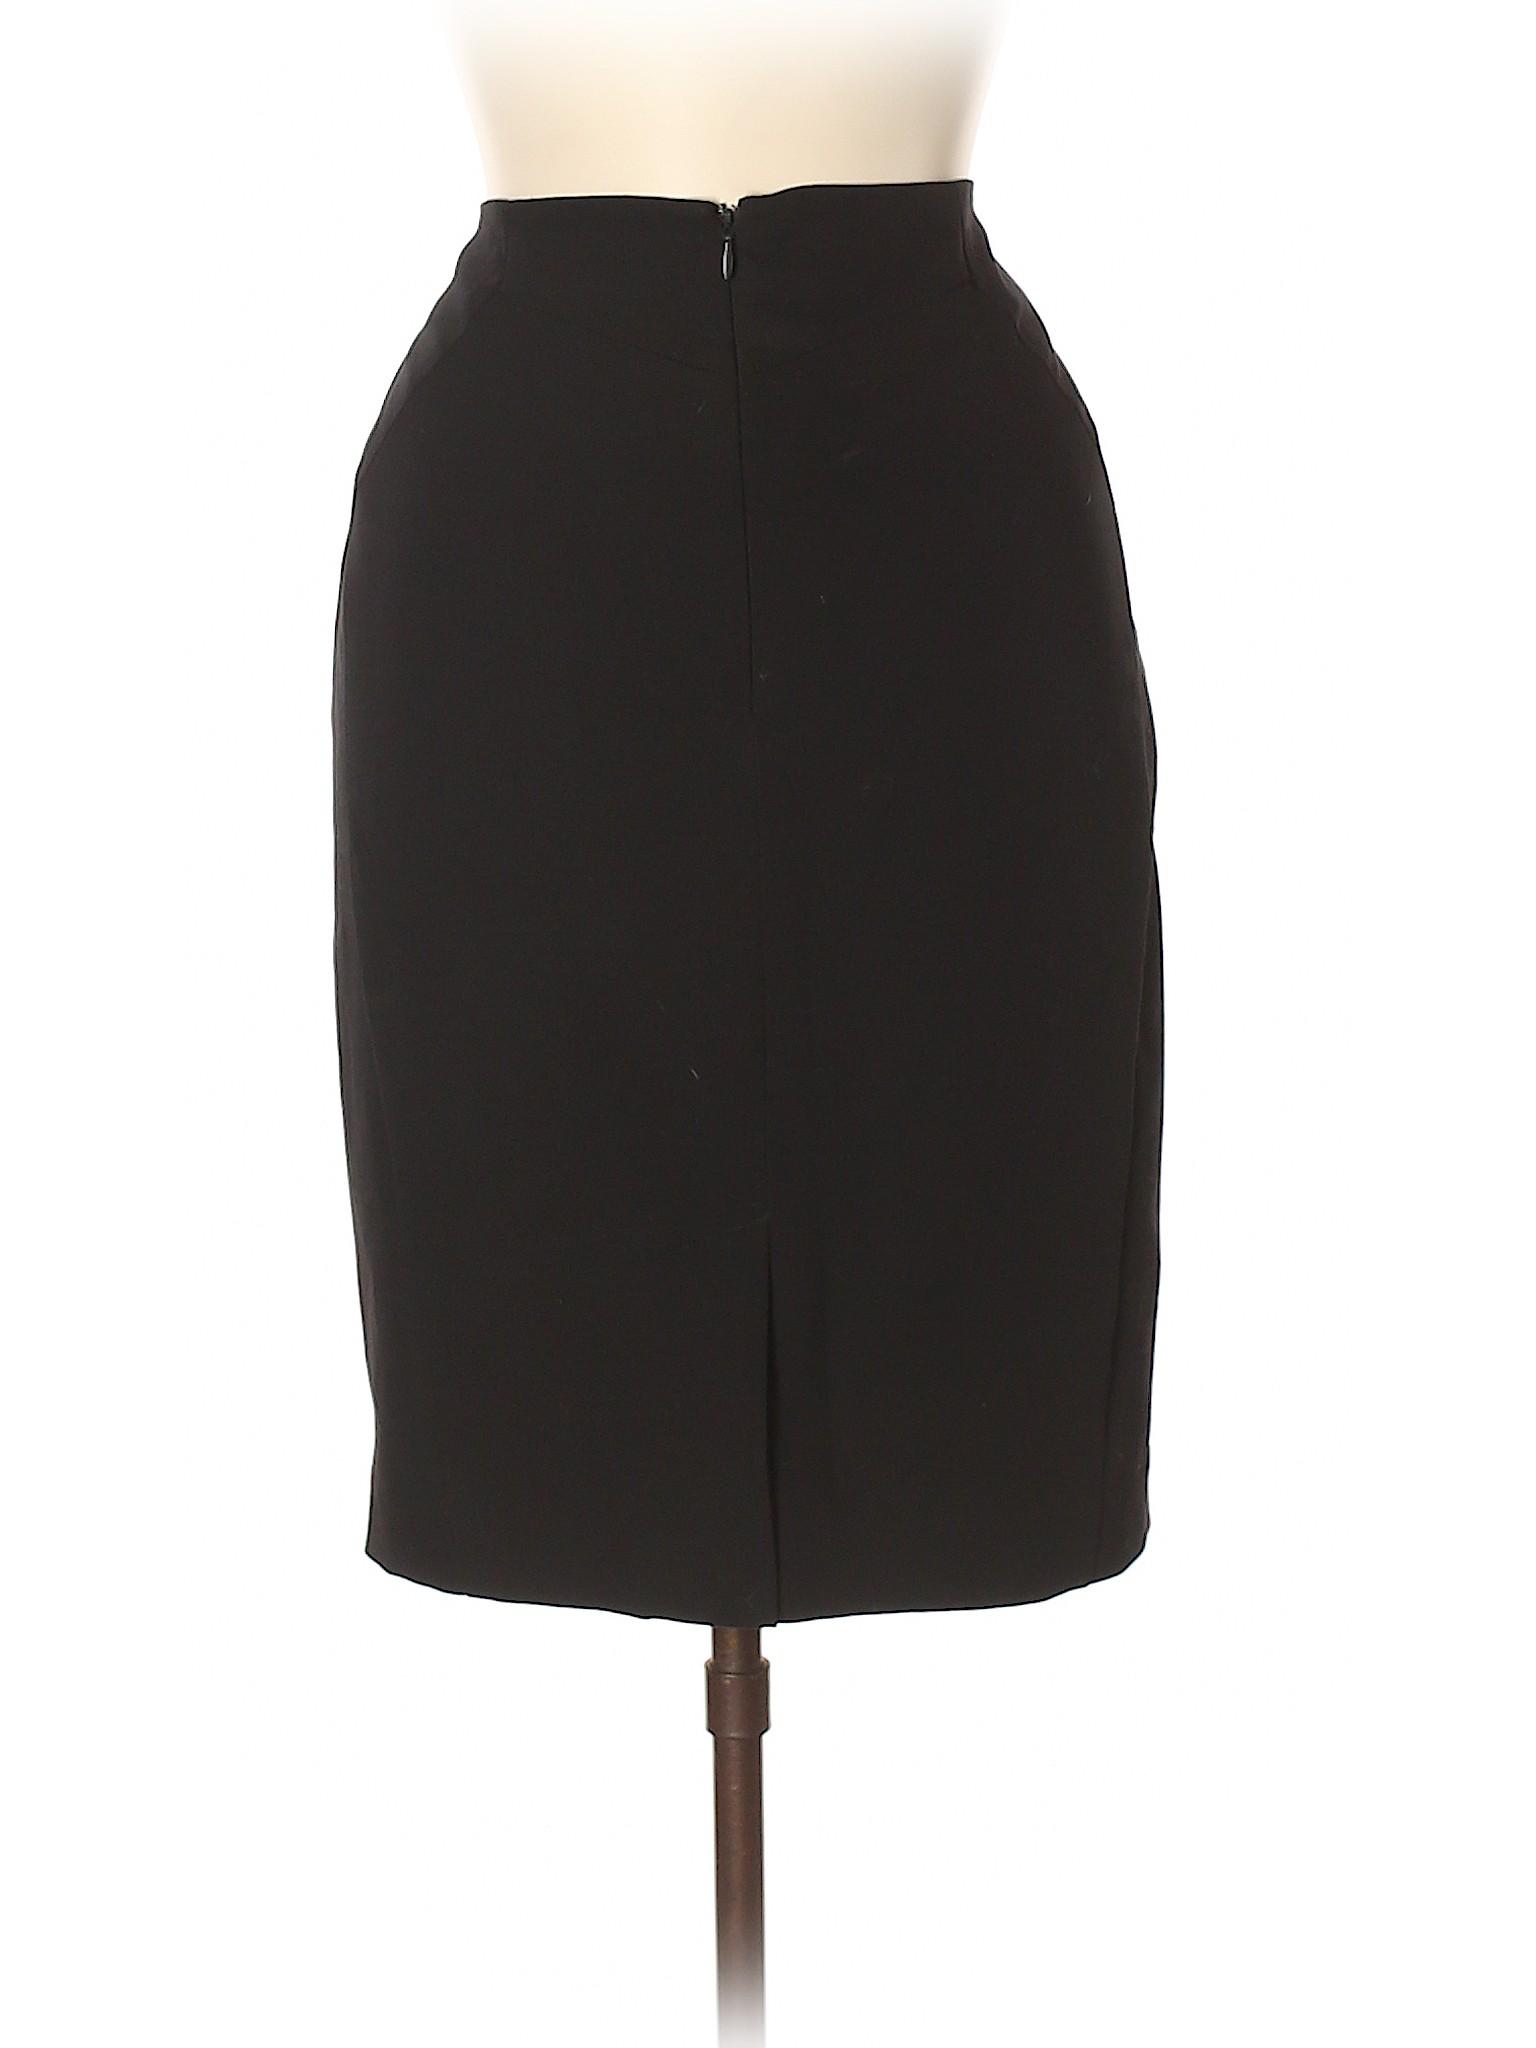 Boutique Casual Casual Boutique Skirt vxanXq